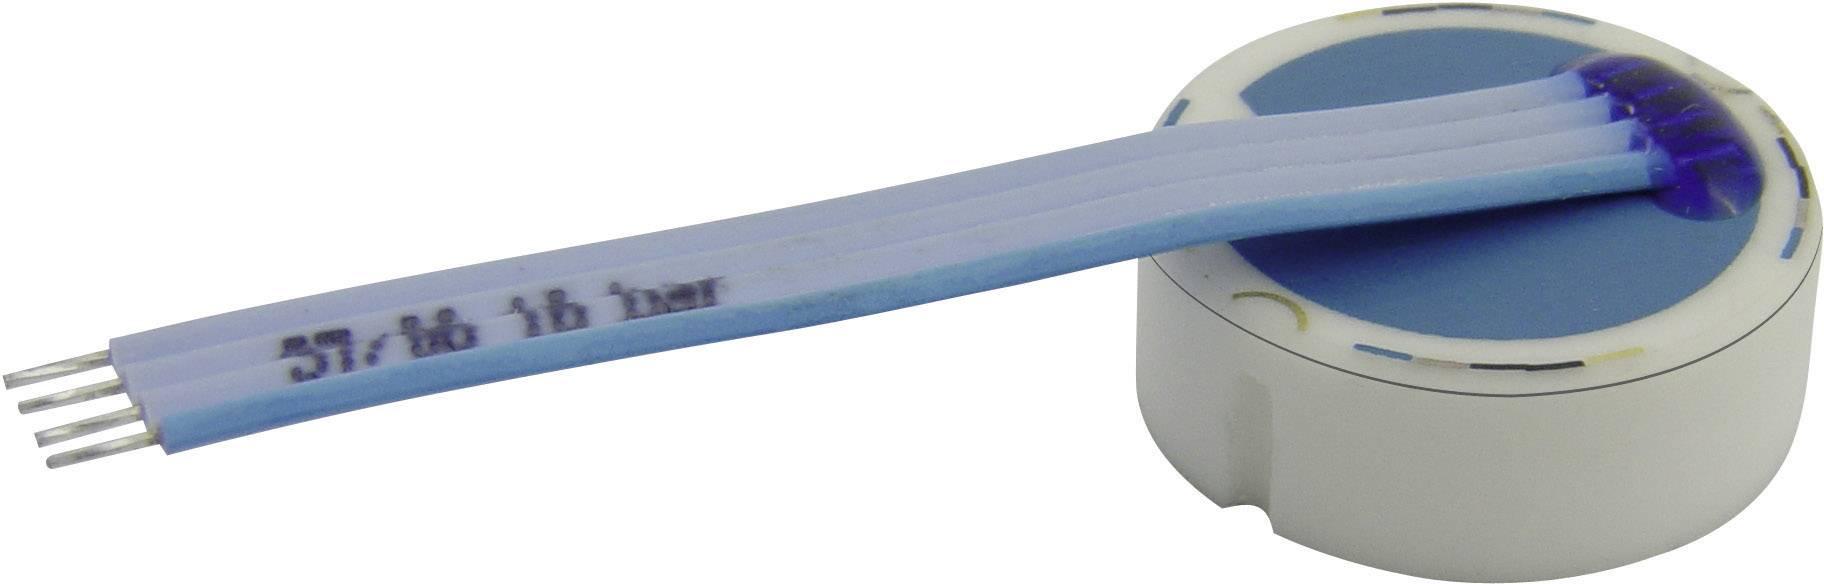 Senzor tlaku B & B Thermo-Technik DS-KE-D-A1B, 1 bar do 1 bar